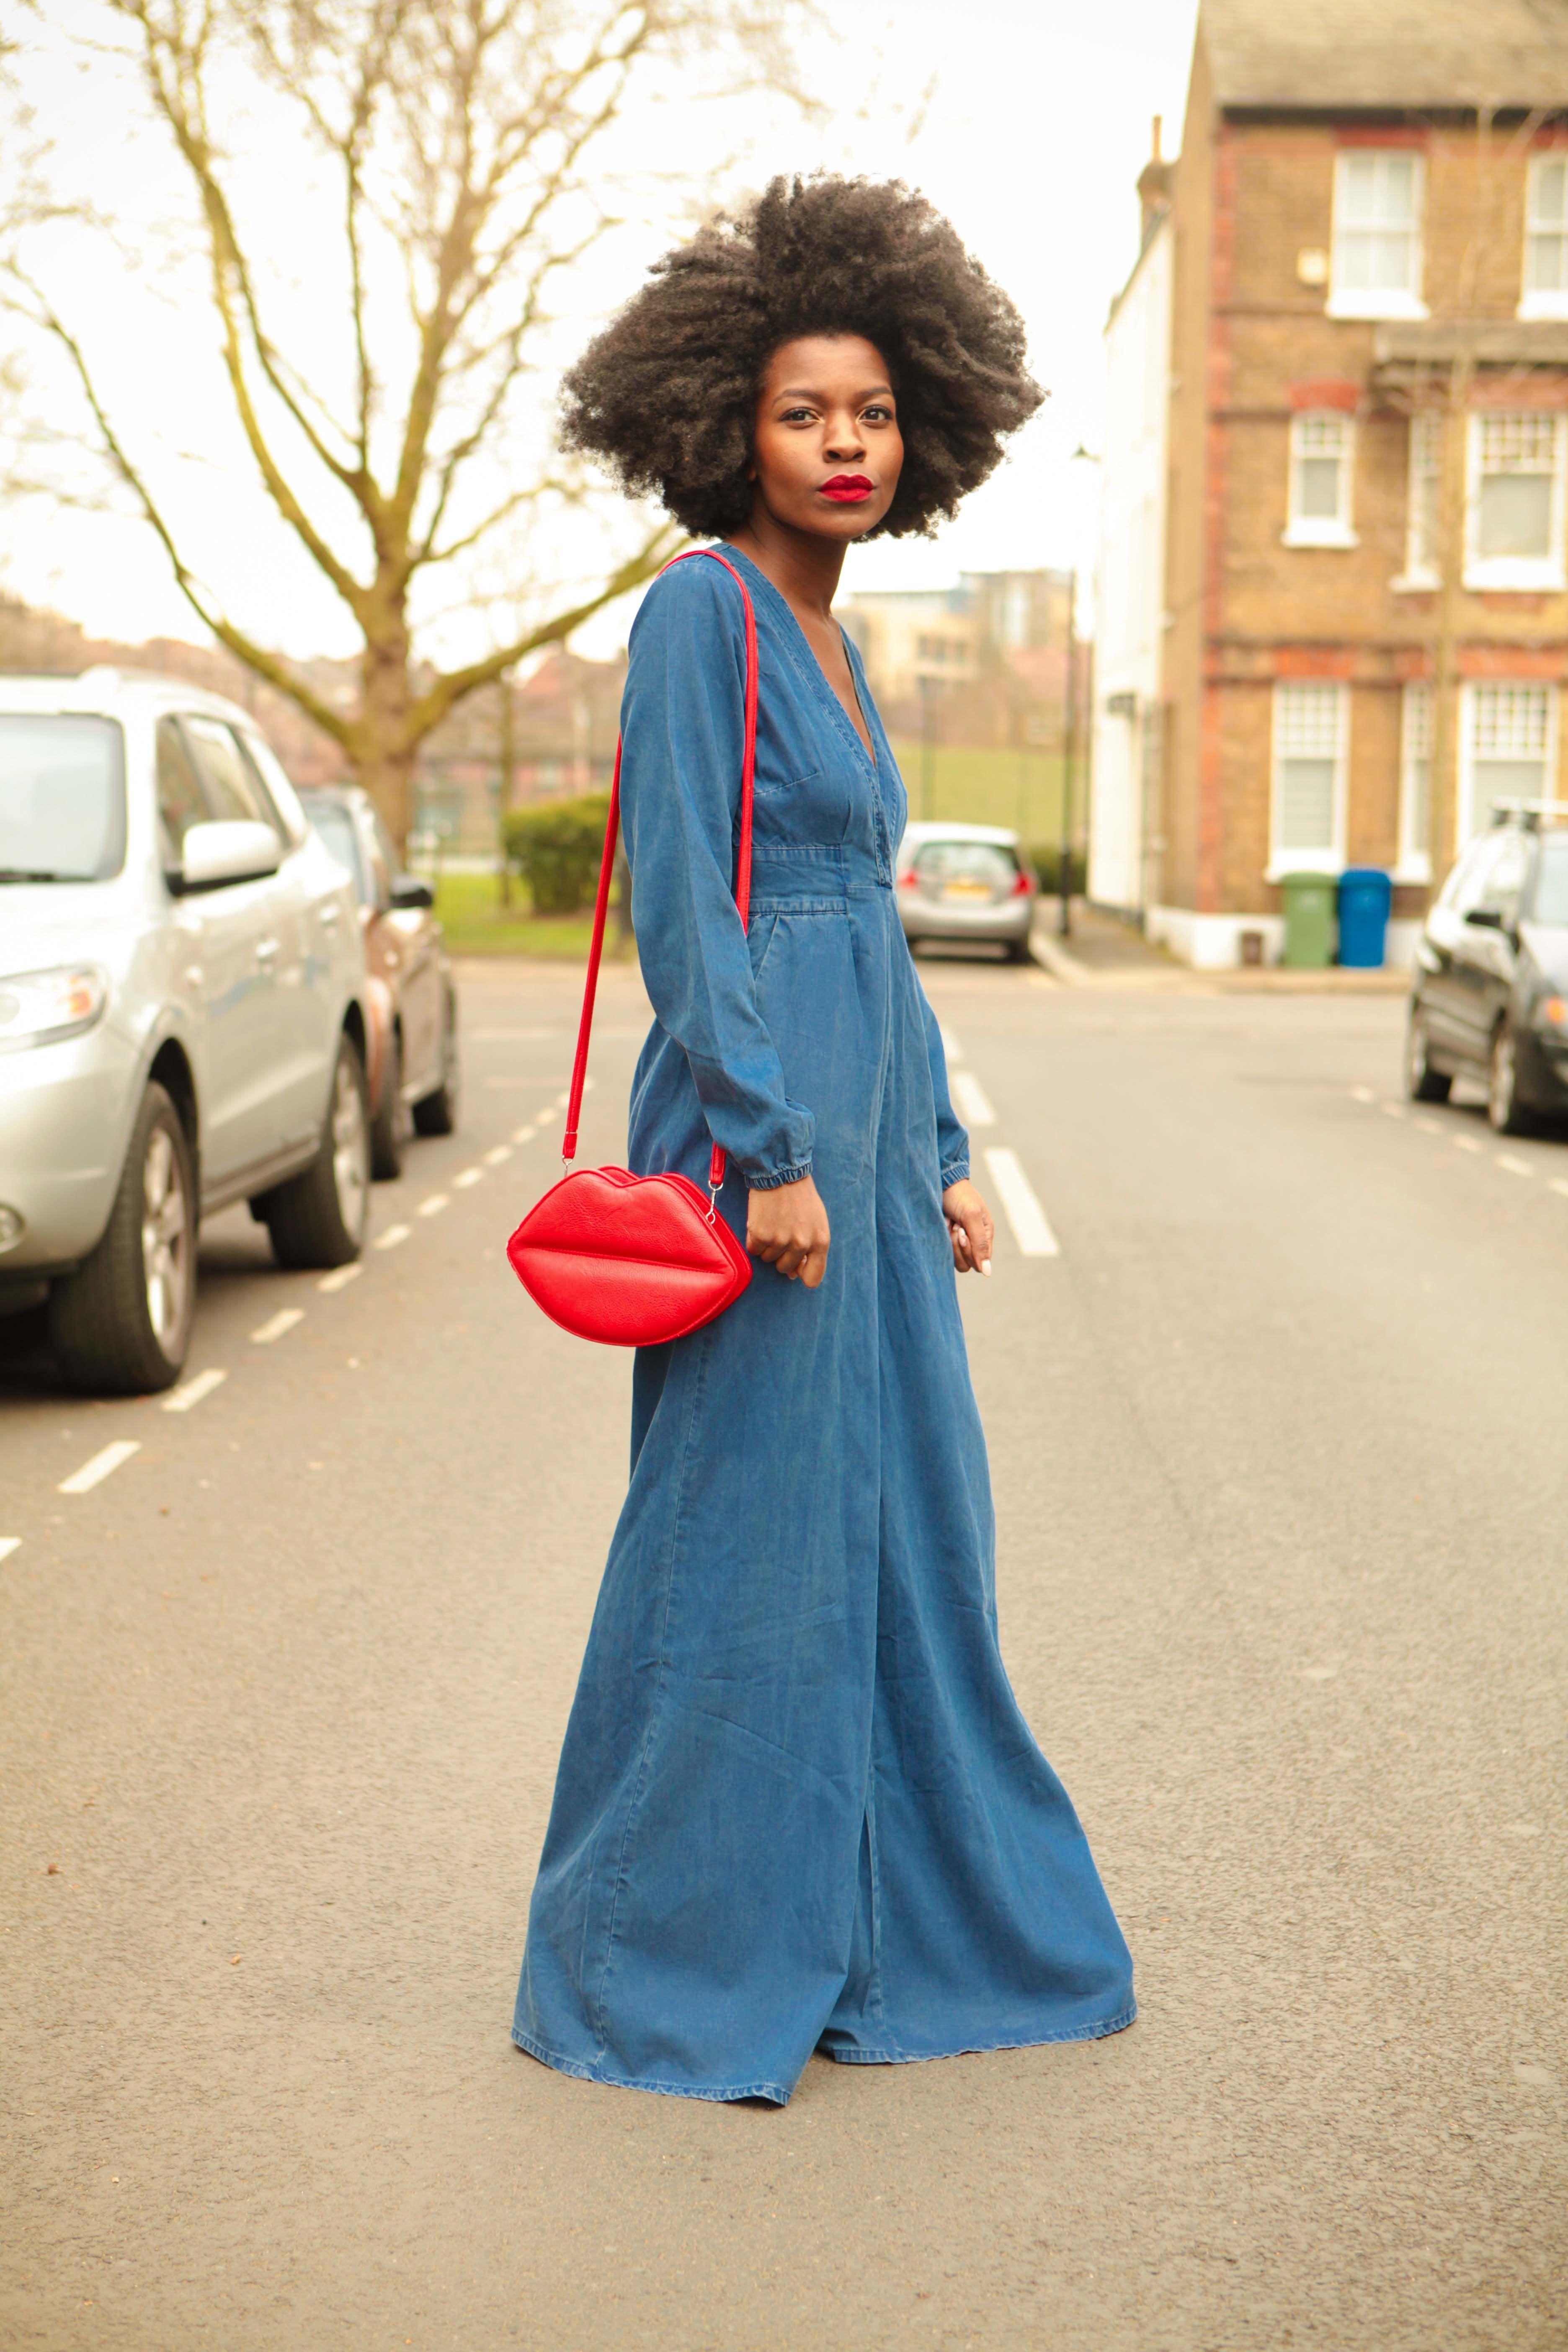 43ed751ef5a ASOS denim jumpsuit - lip clutch - afro - 70s - Freddie Harrel ...